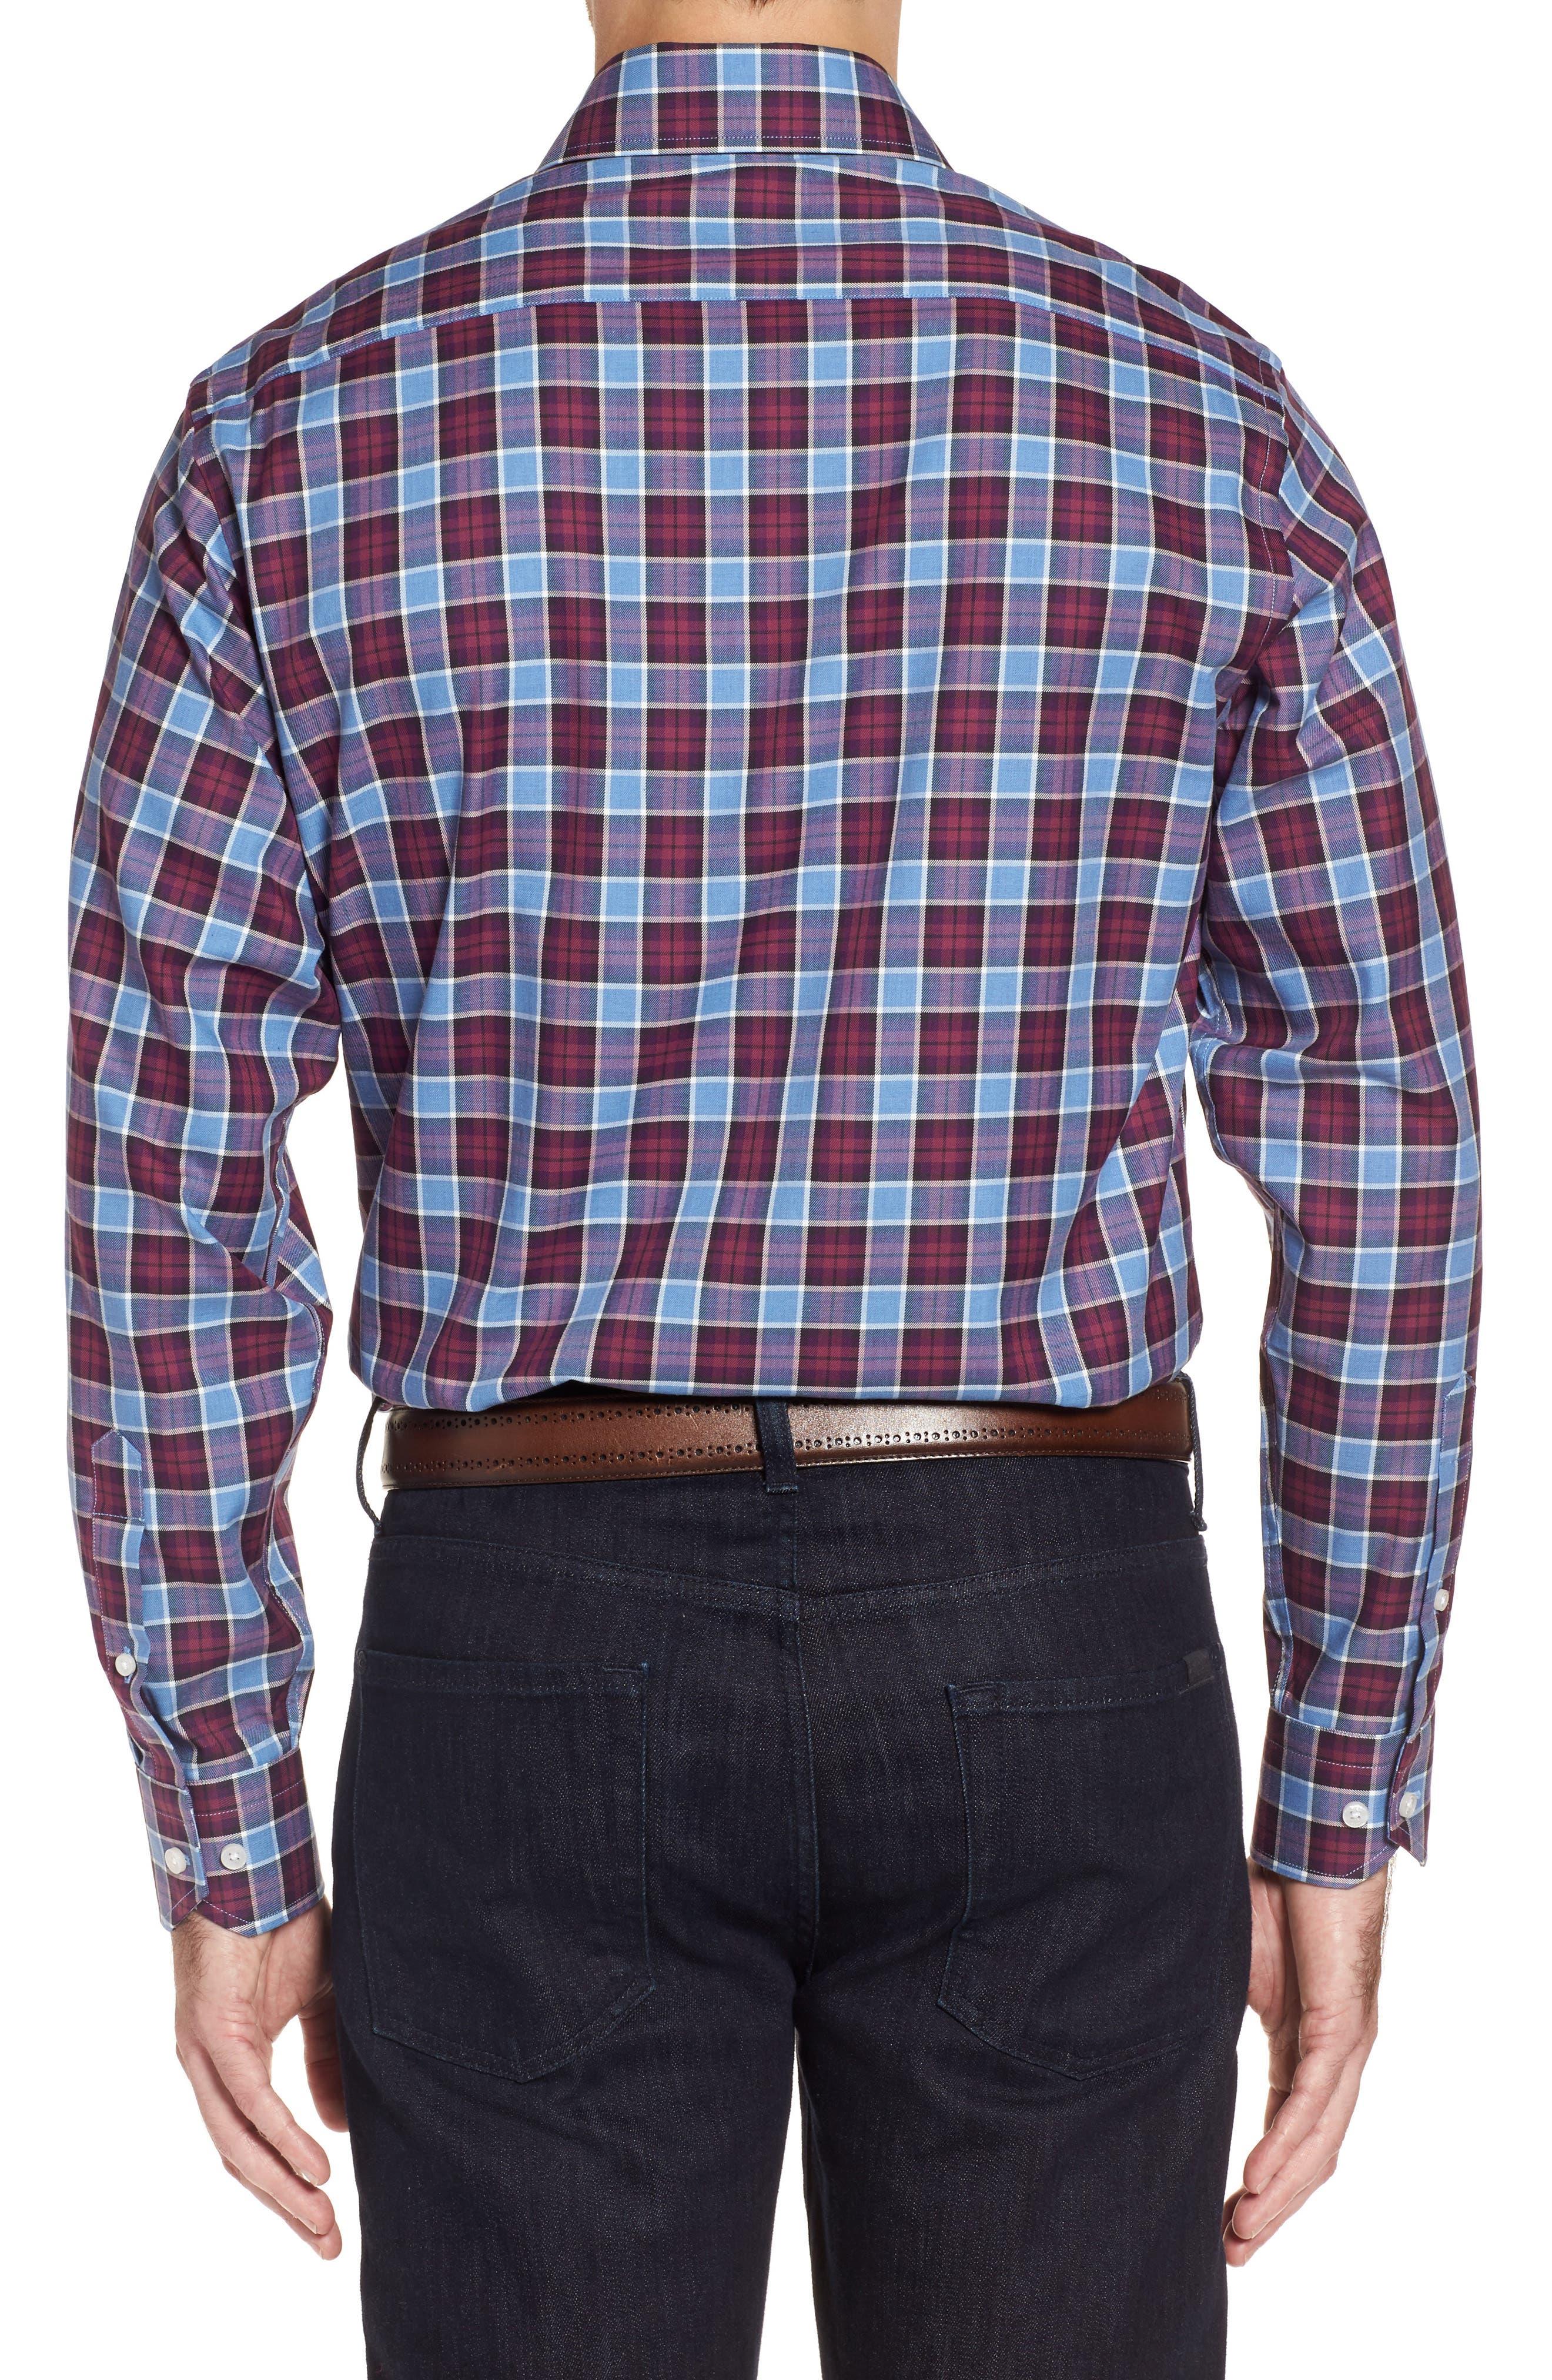 Campti Regular Fit Plaid Sport Shirt,                             Alternate thumbnail 2, color,                             Purple